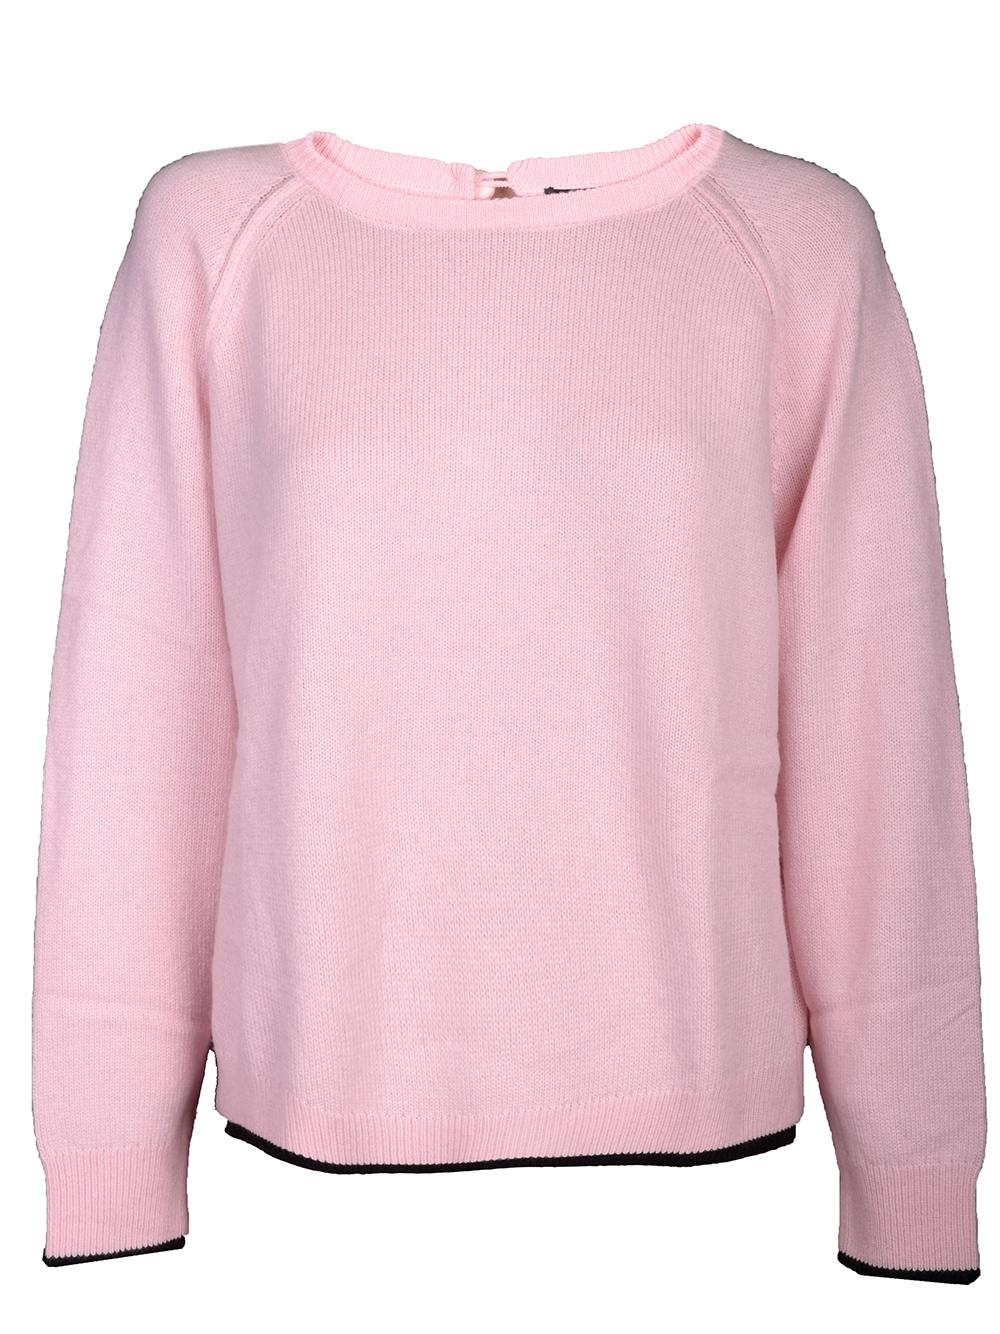 EMPORIO ARMANI Μπλούζα πουλόβερ 6G2MUA 2M39Z ΡΟΖ